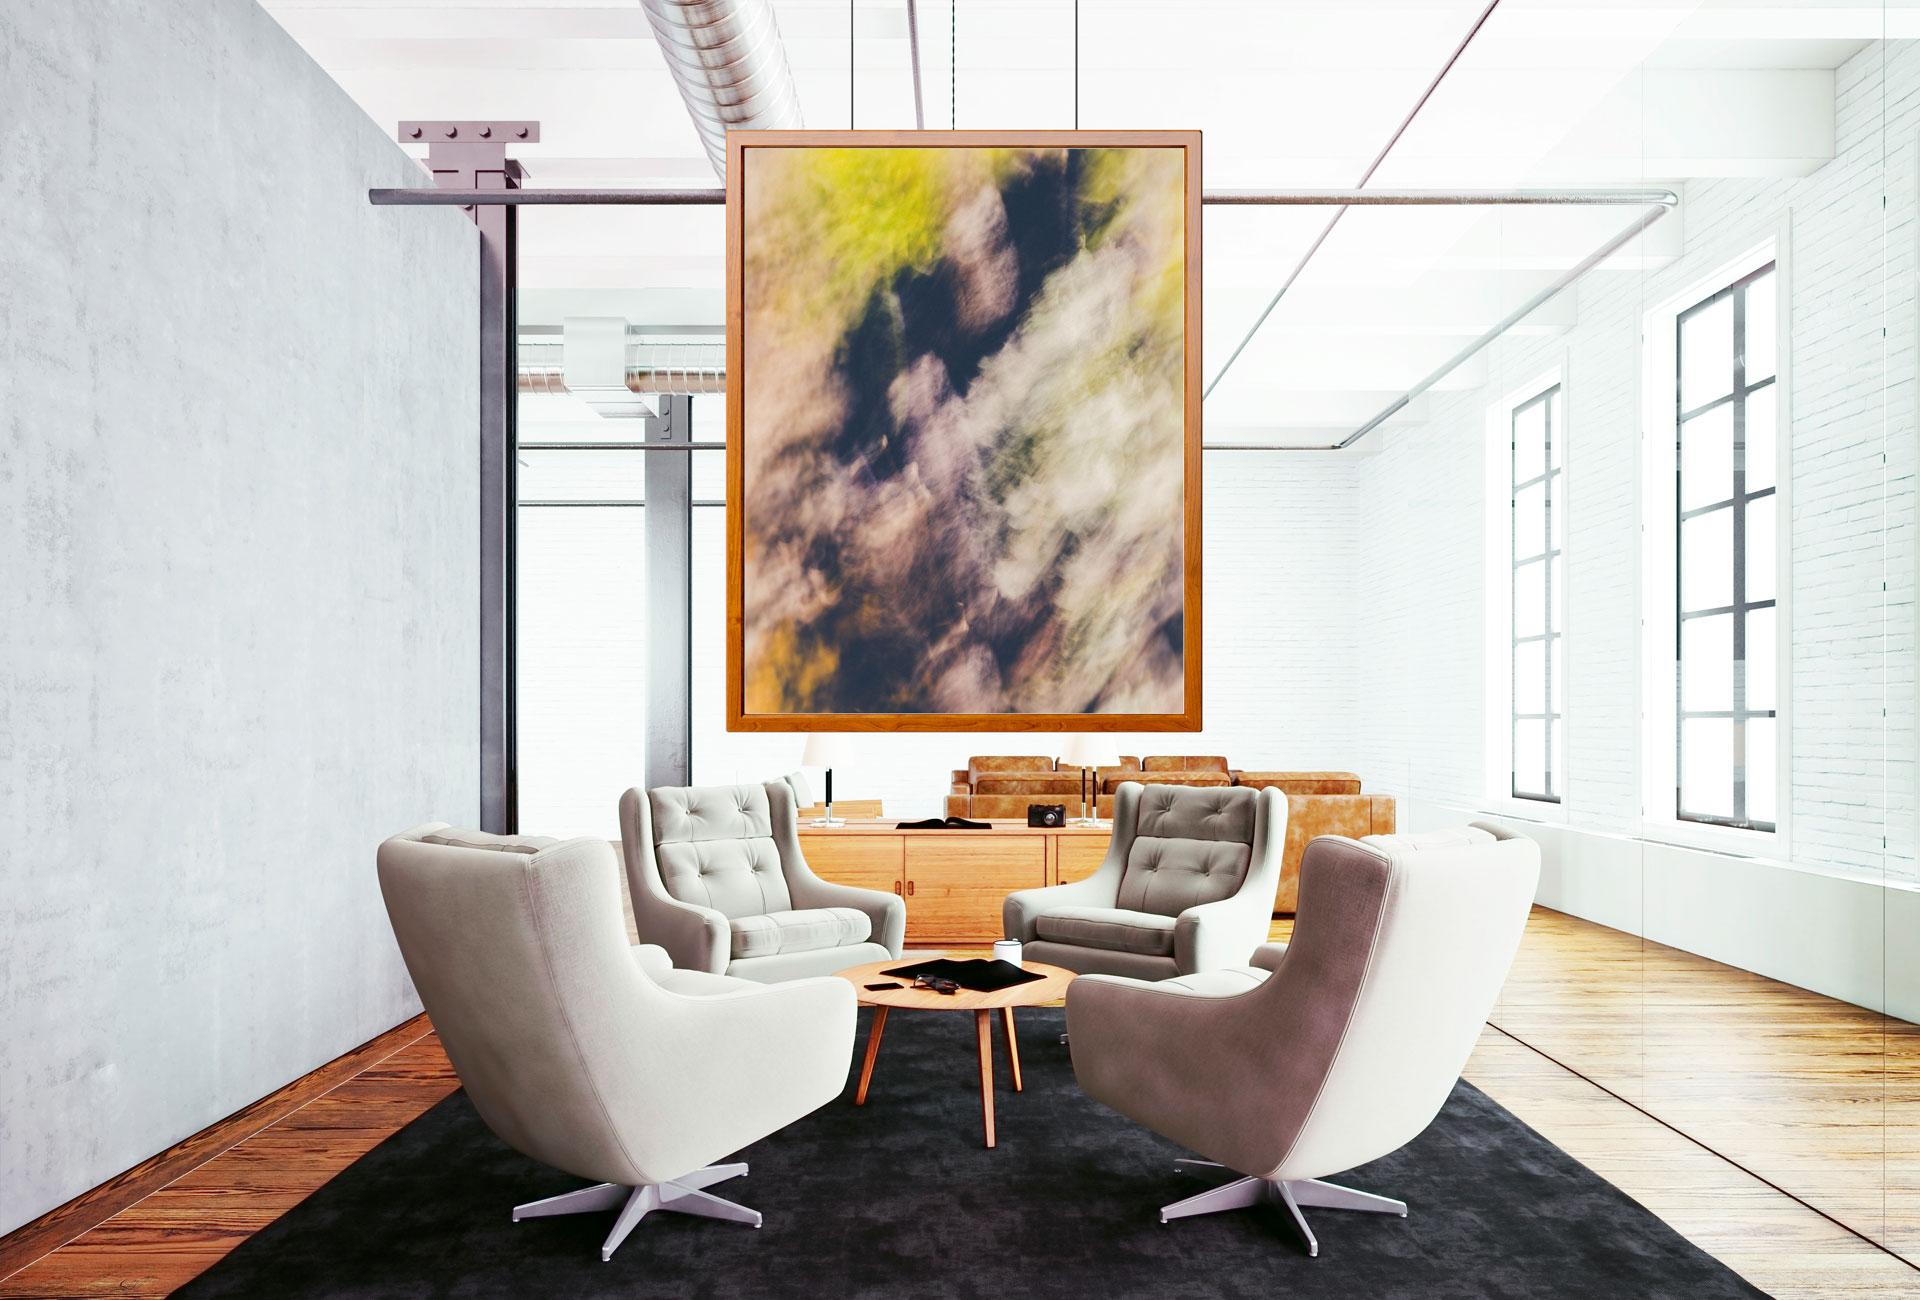 simoarts-com-simone-kessler-fotokunst-nuernberg-blumen-abstrakt-Motiv01-1